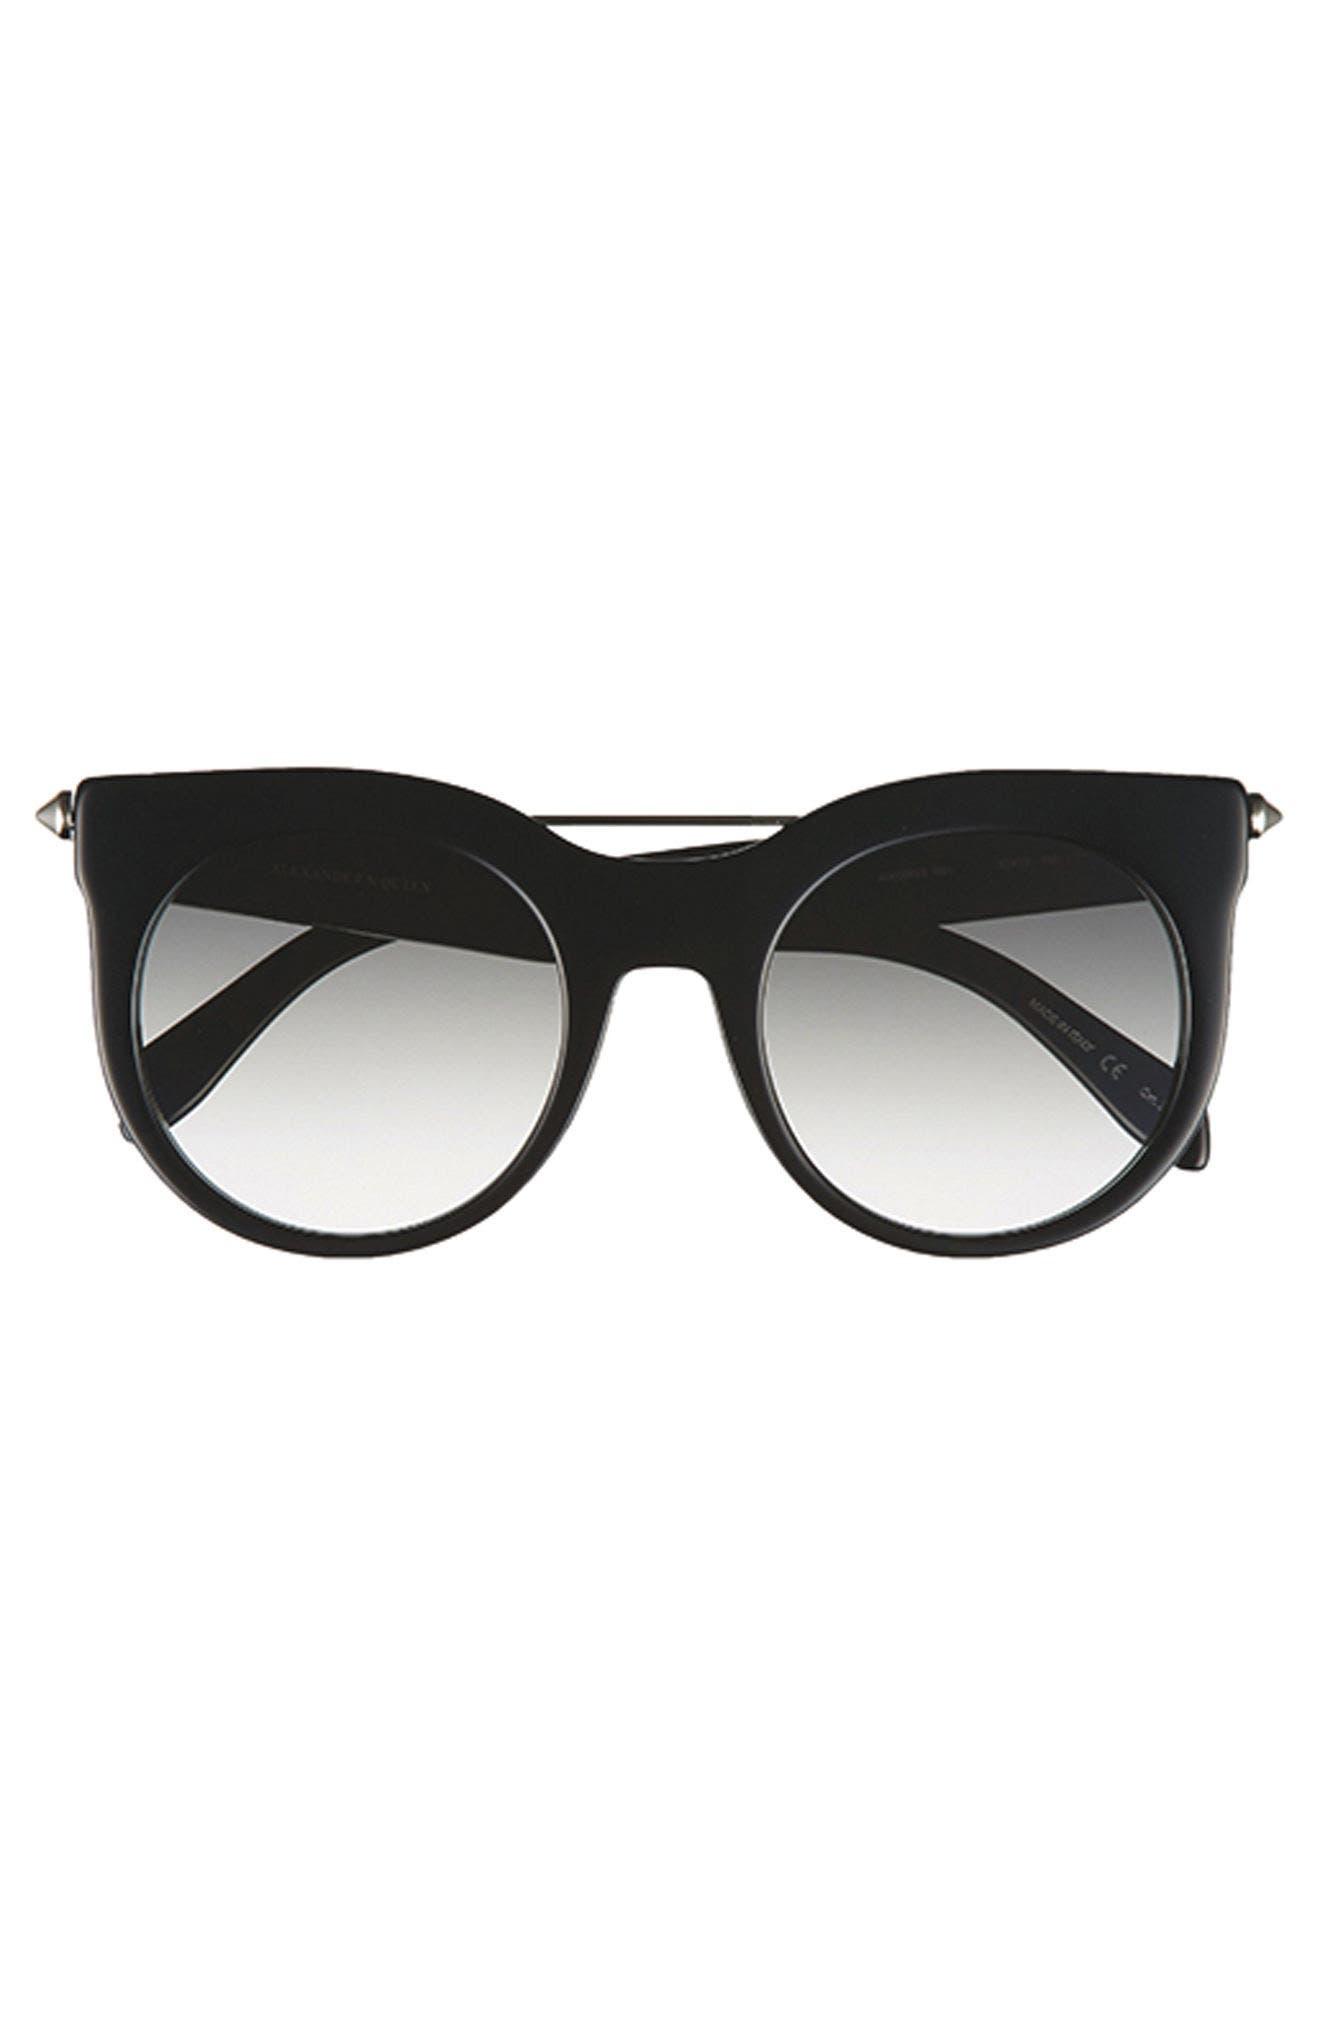 52mm Cat Eye Sunglasses,                             Alternate thumbnail 4, color,                             001